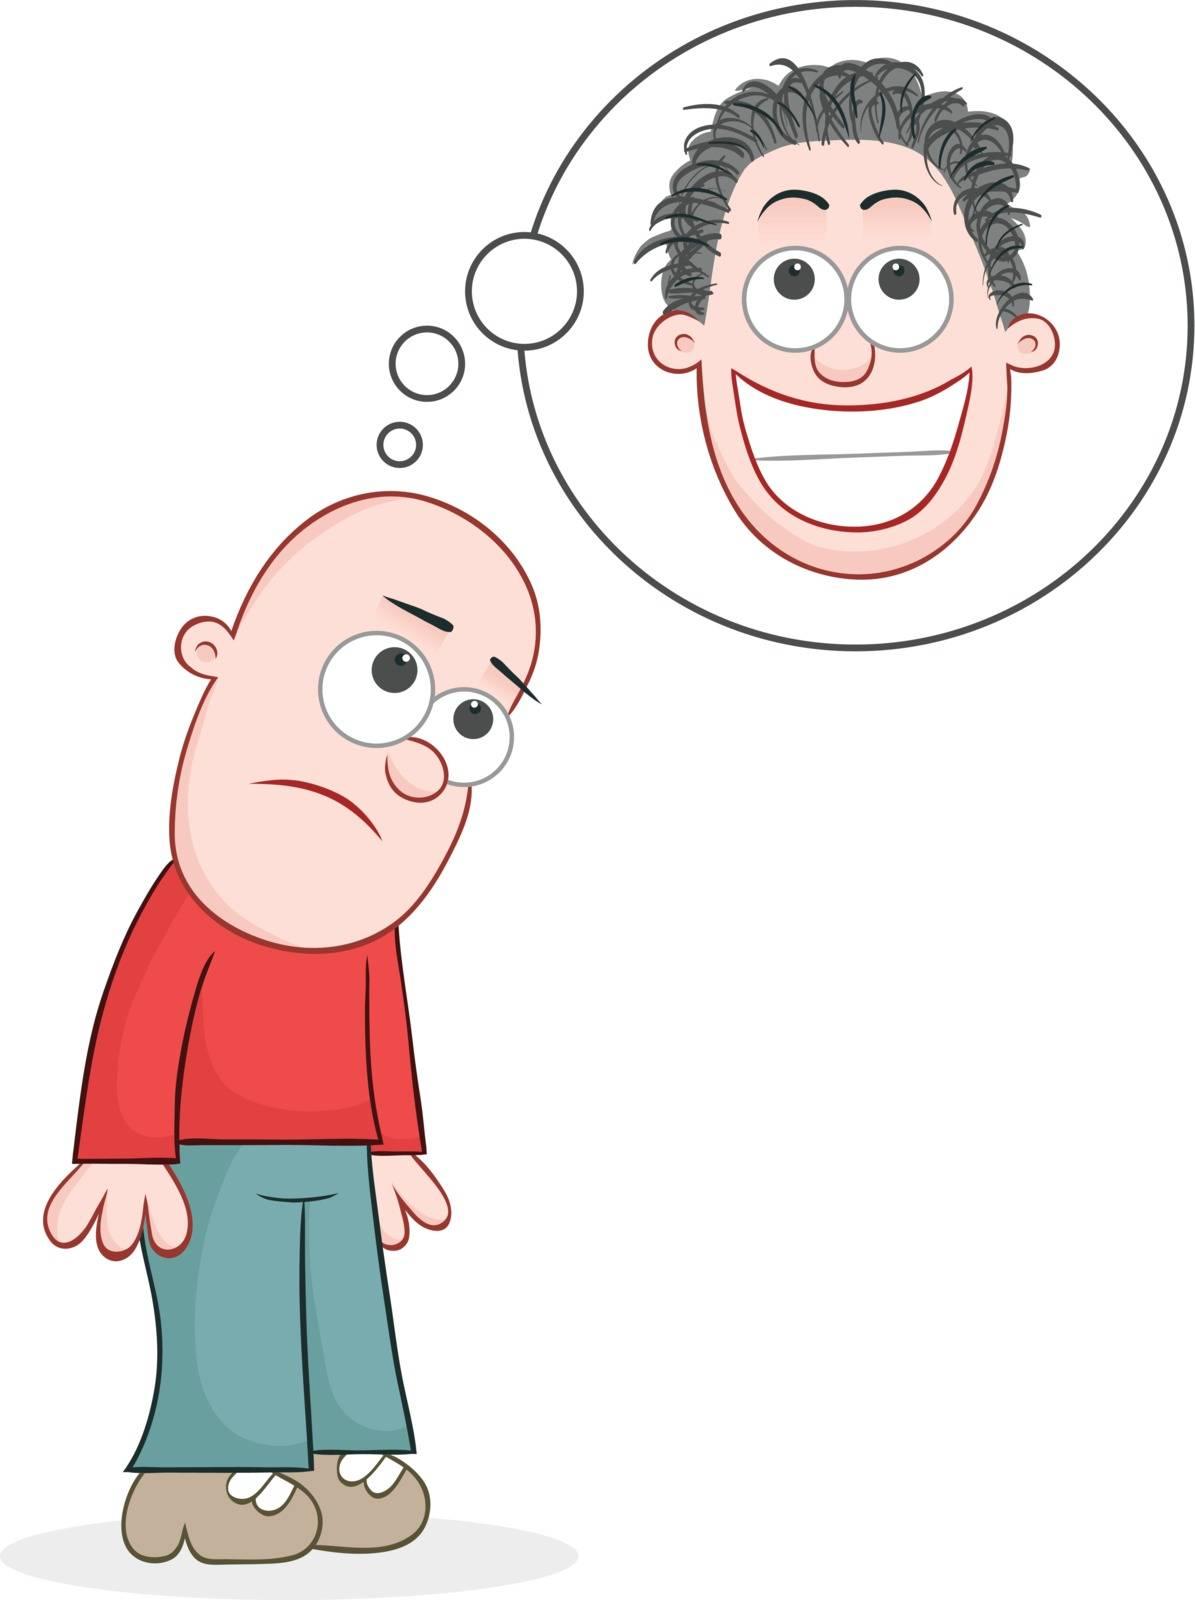 Cartoon bald man sad and dreaming of growing hair.